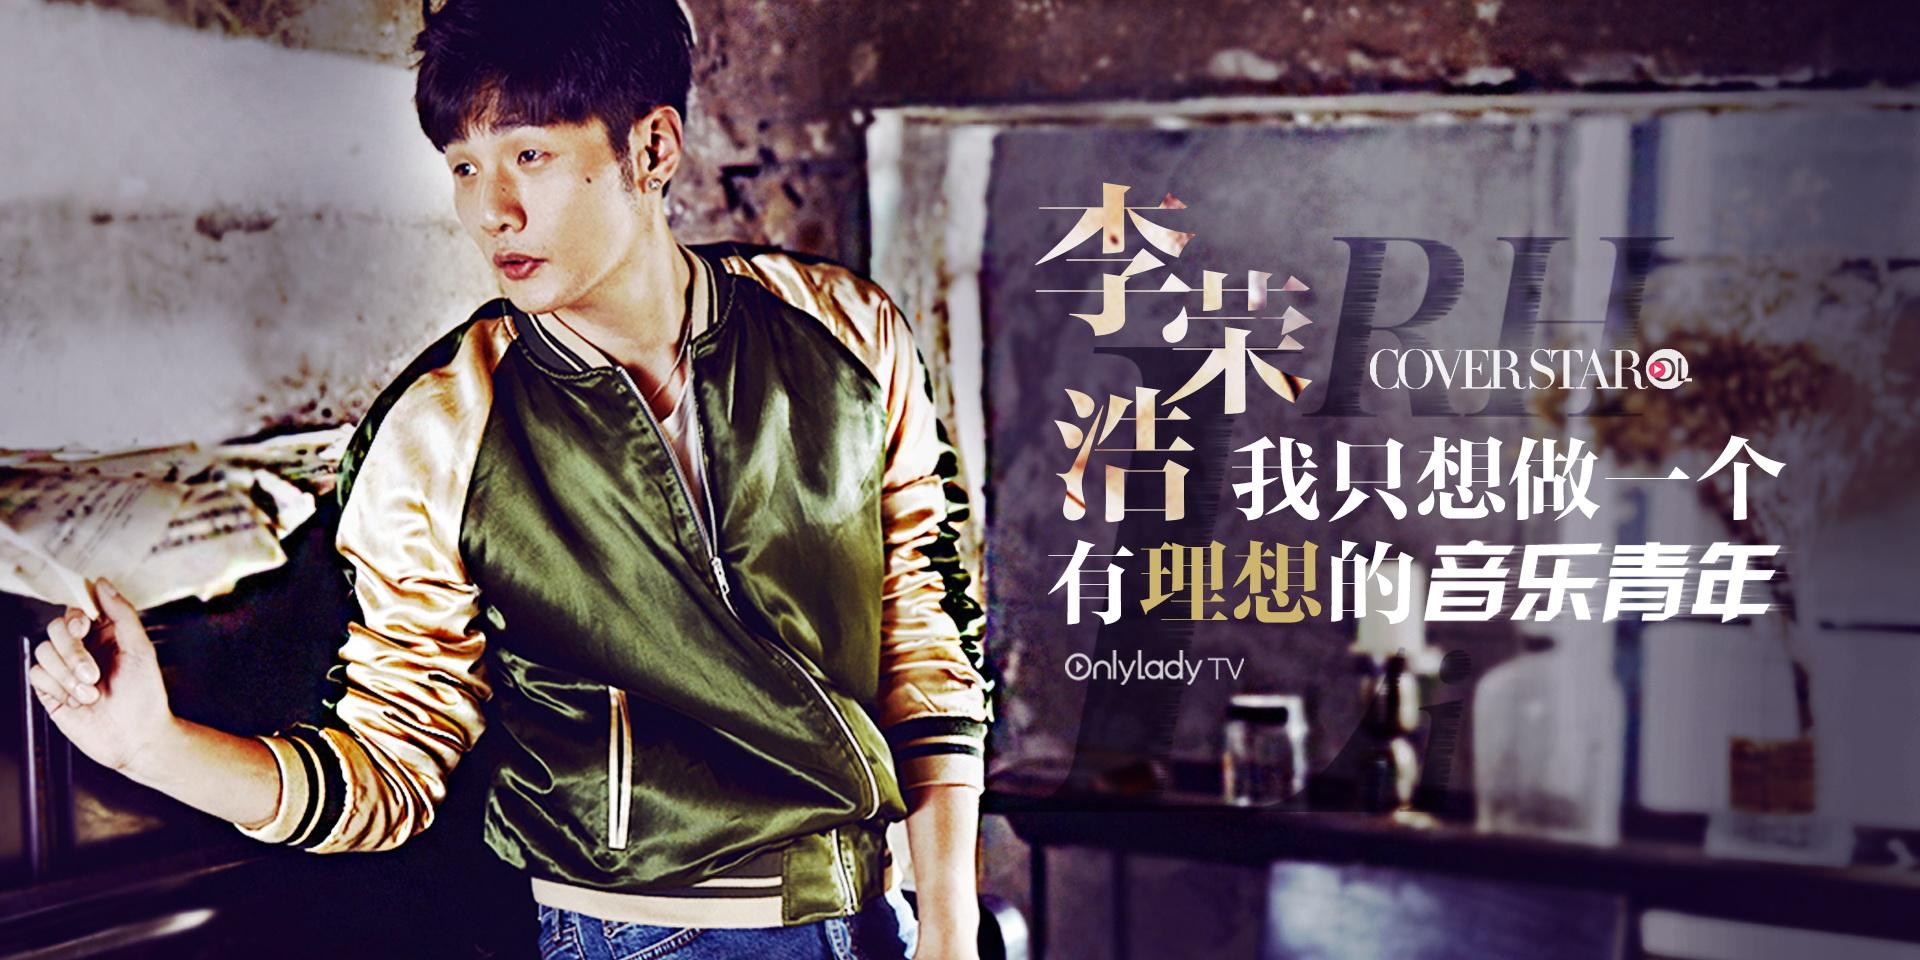 CoverStar 李荣浩:我只想单纯的做一个有理想的音乐青年